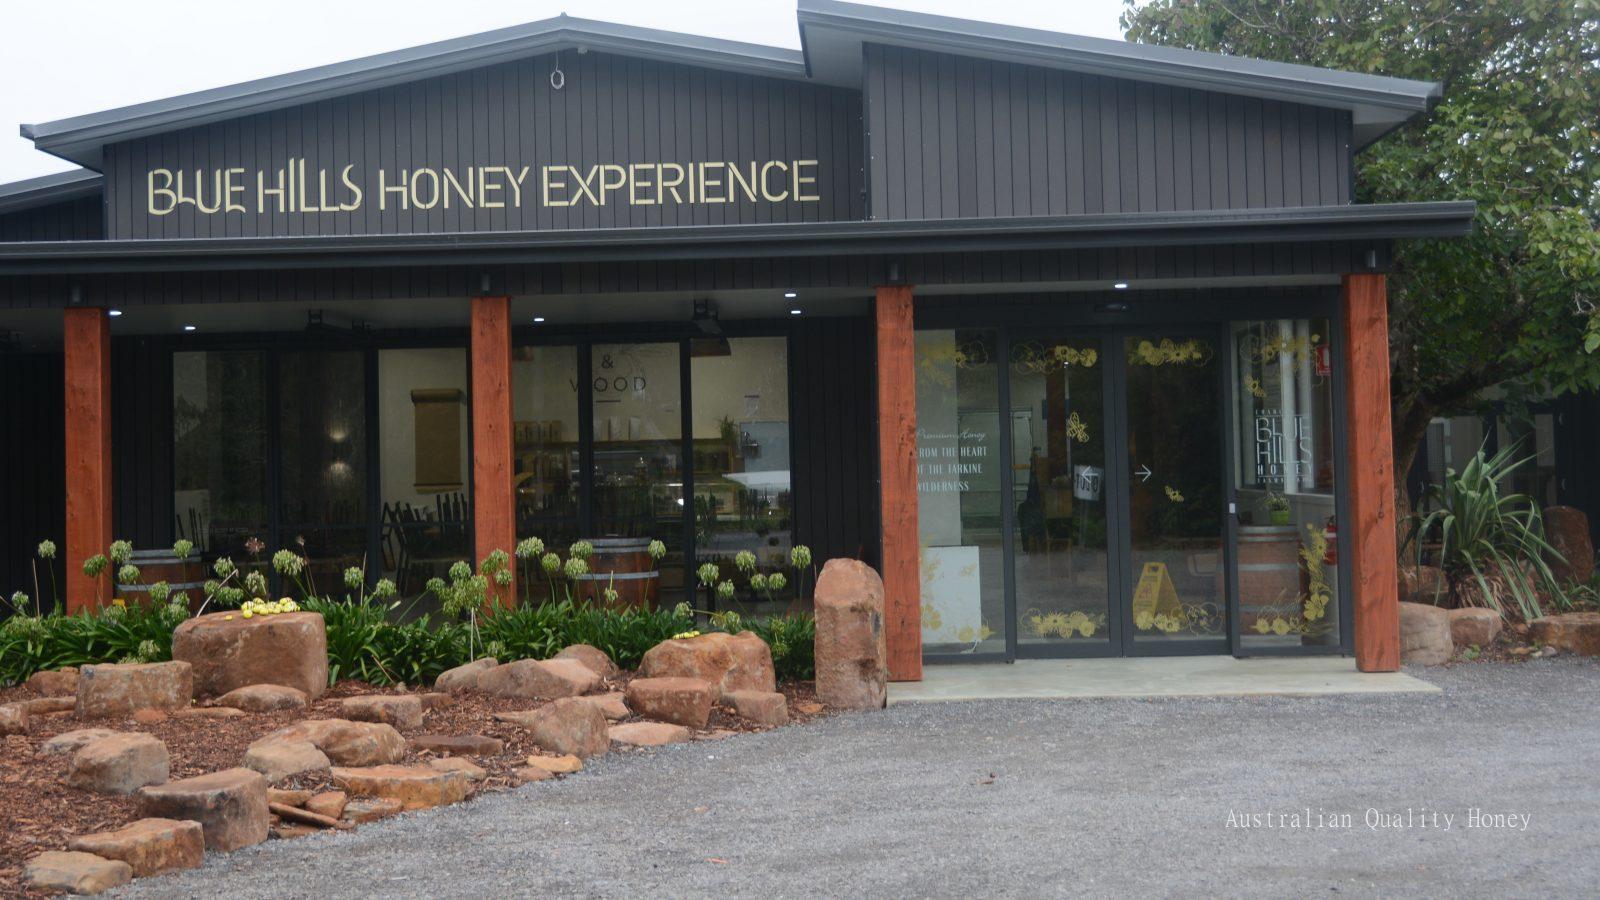 New Bluehills Honey